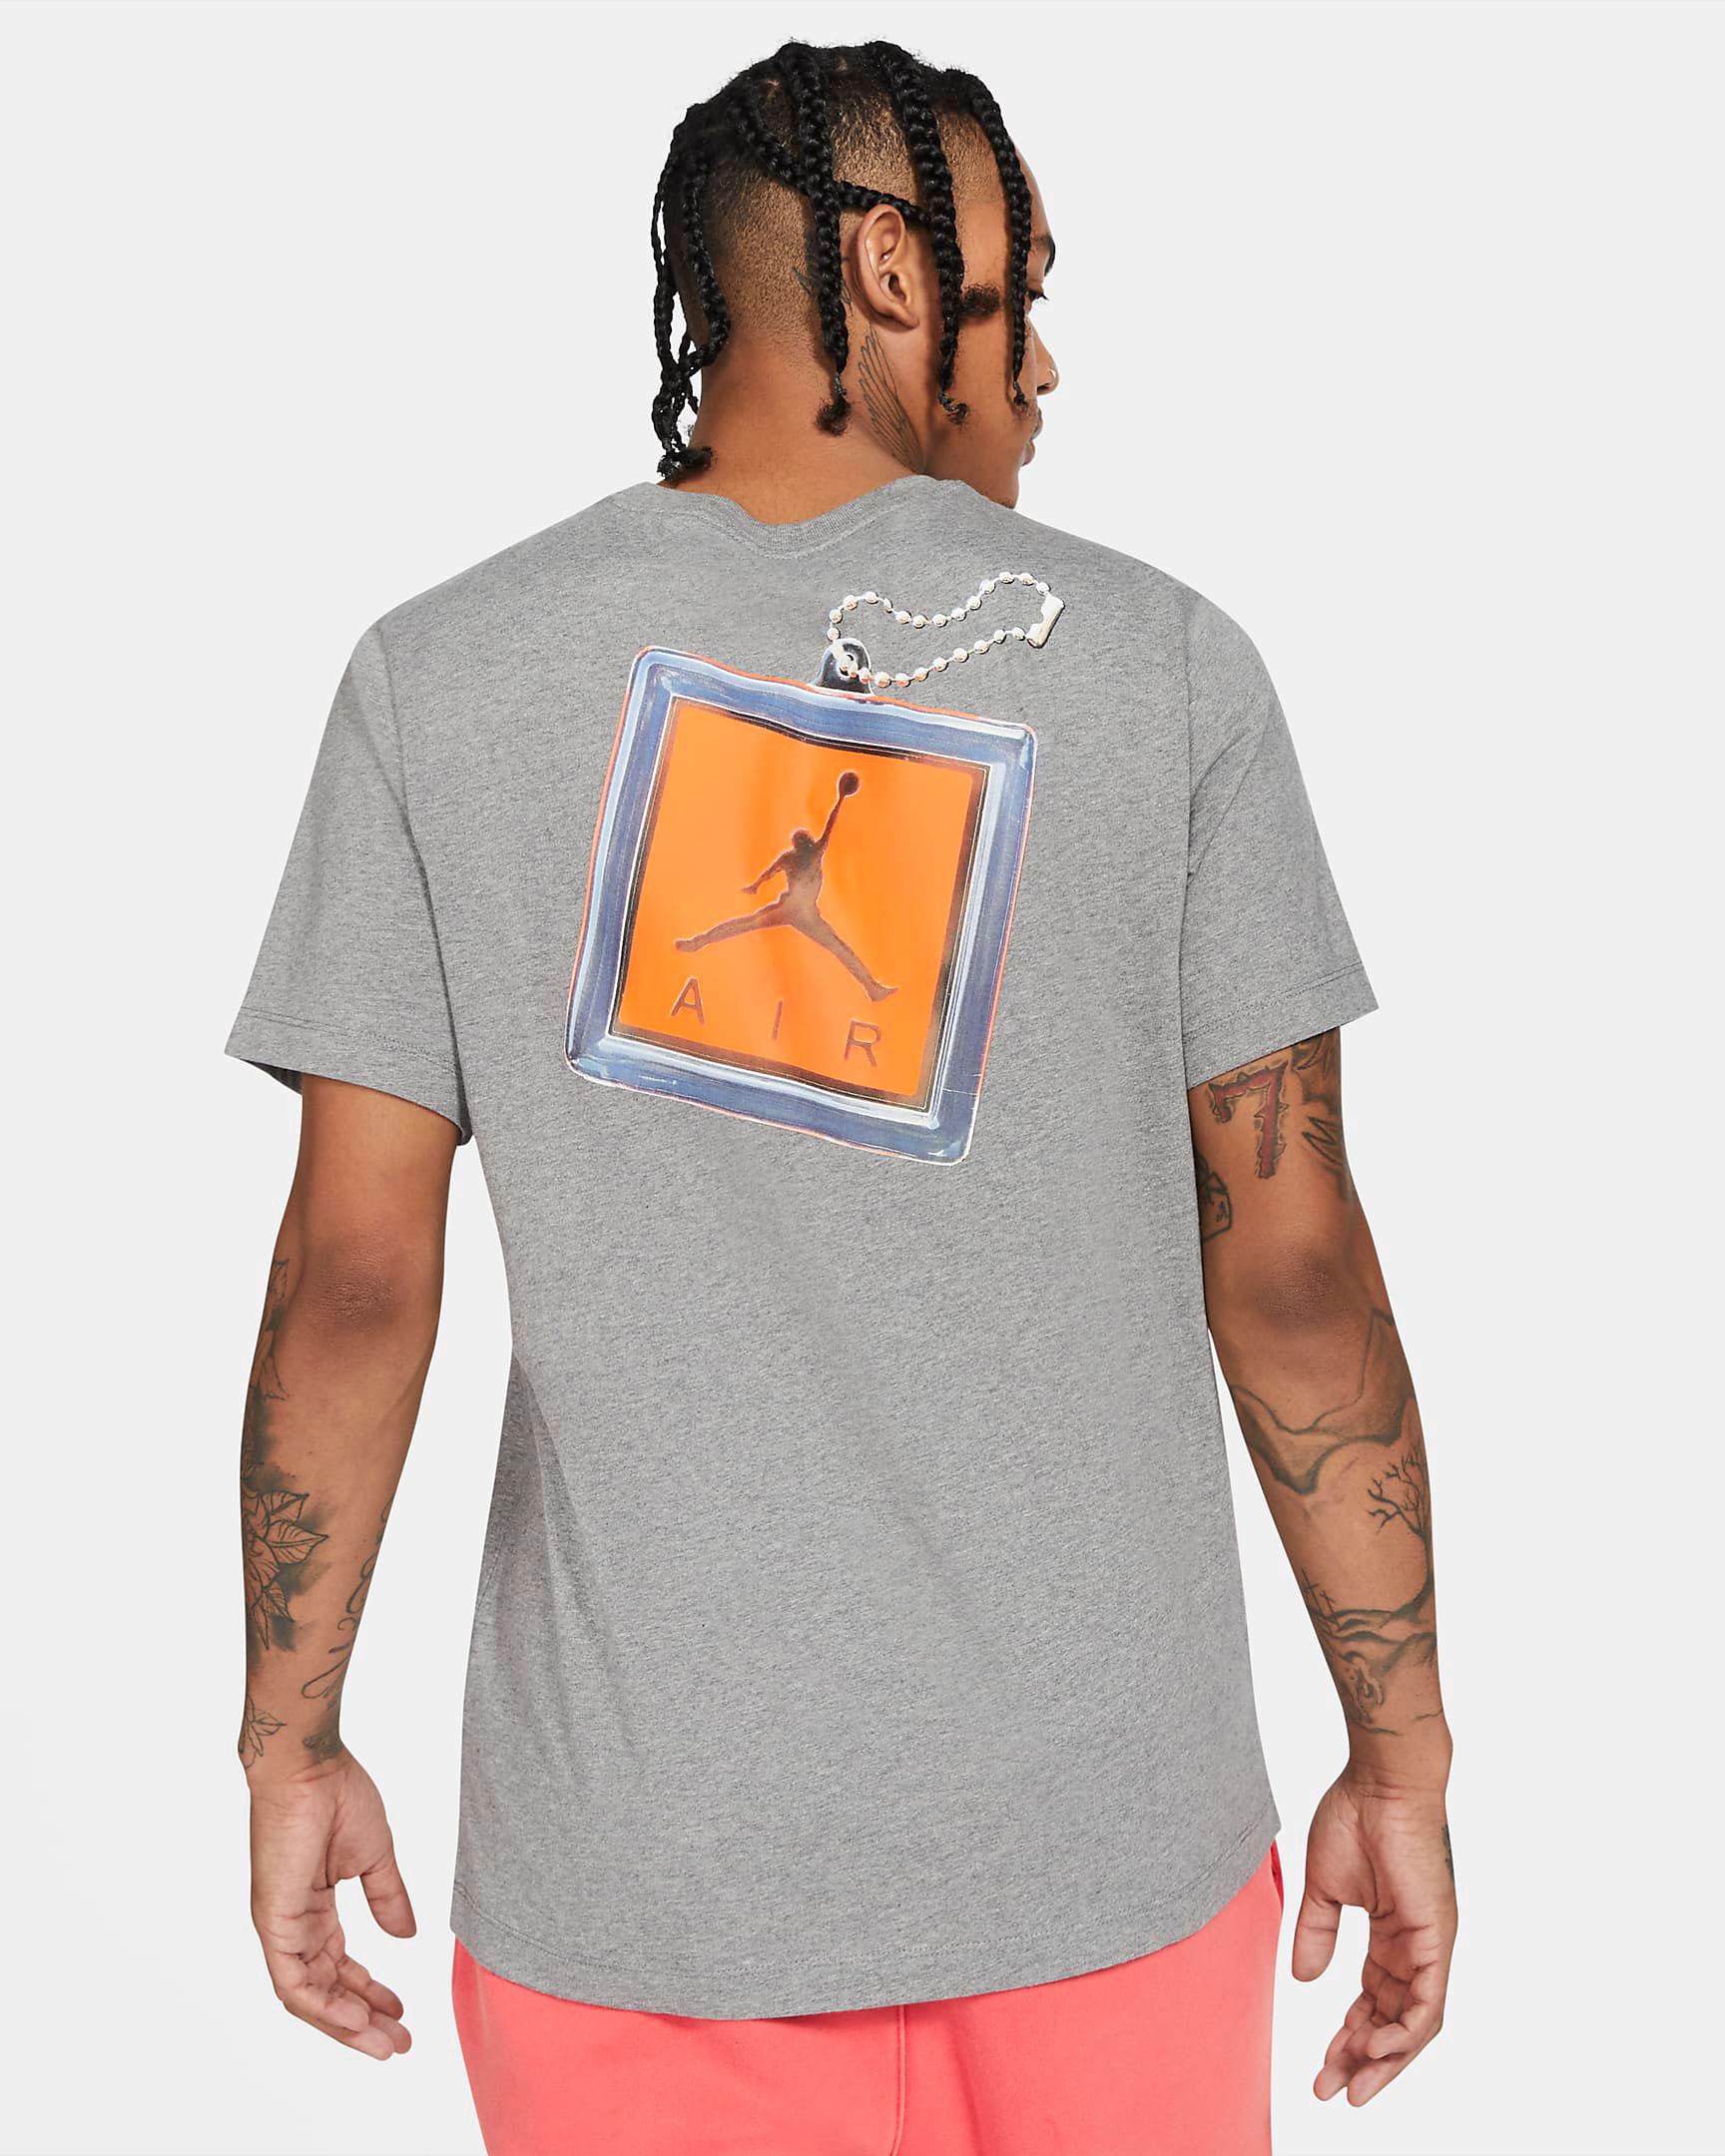 jordan-keychain-shirt-grey-orange-2